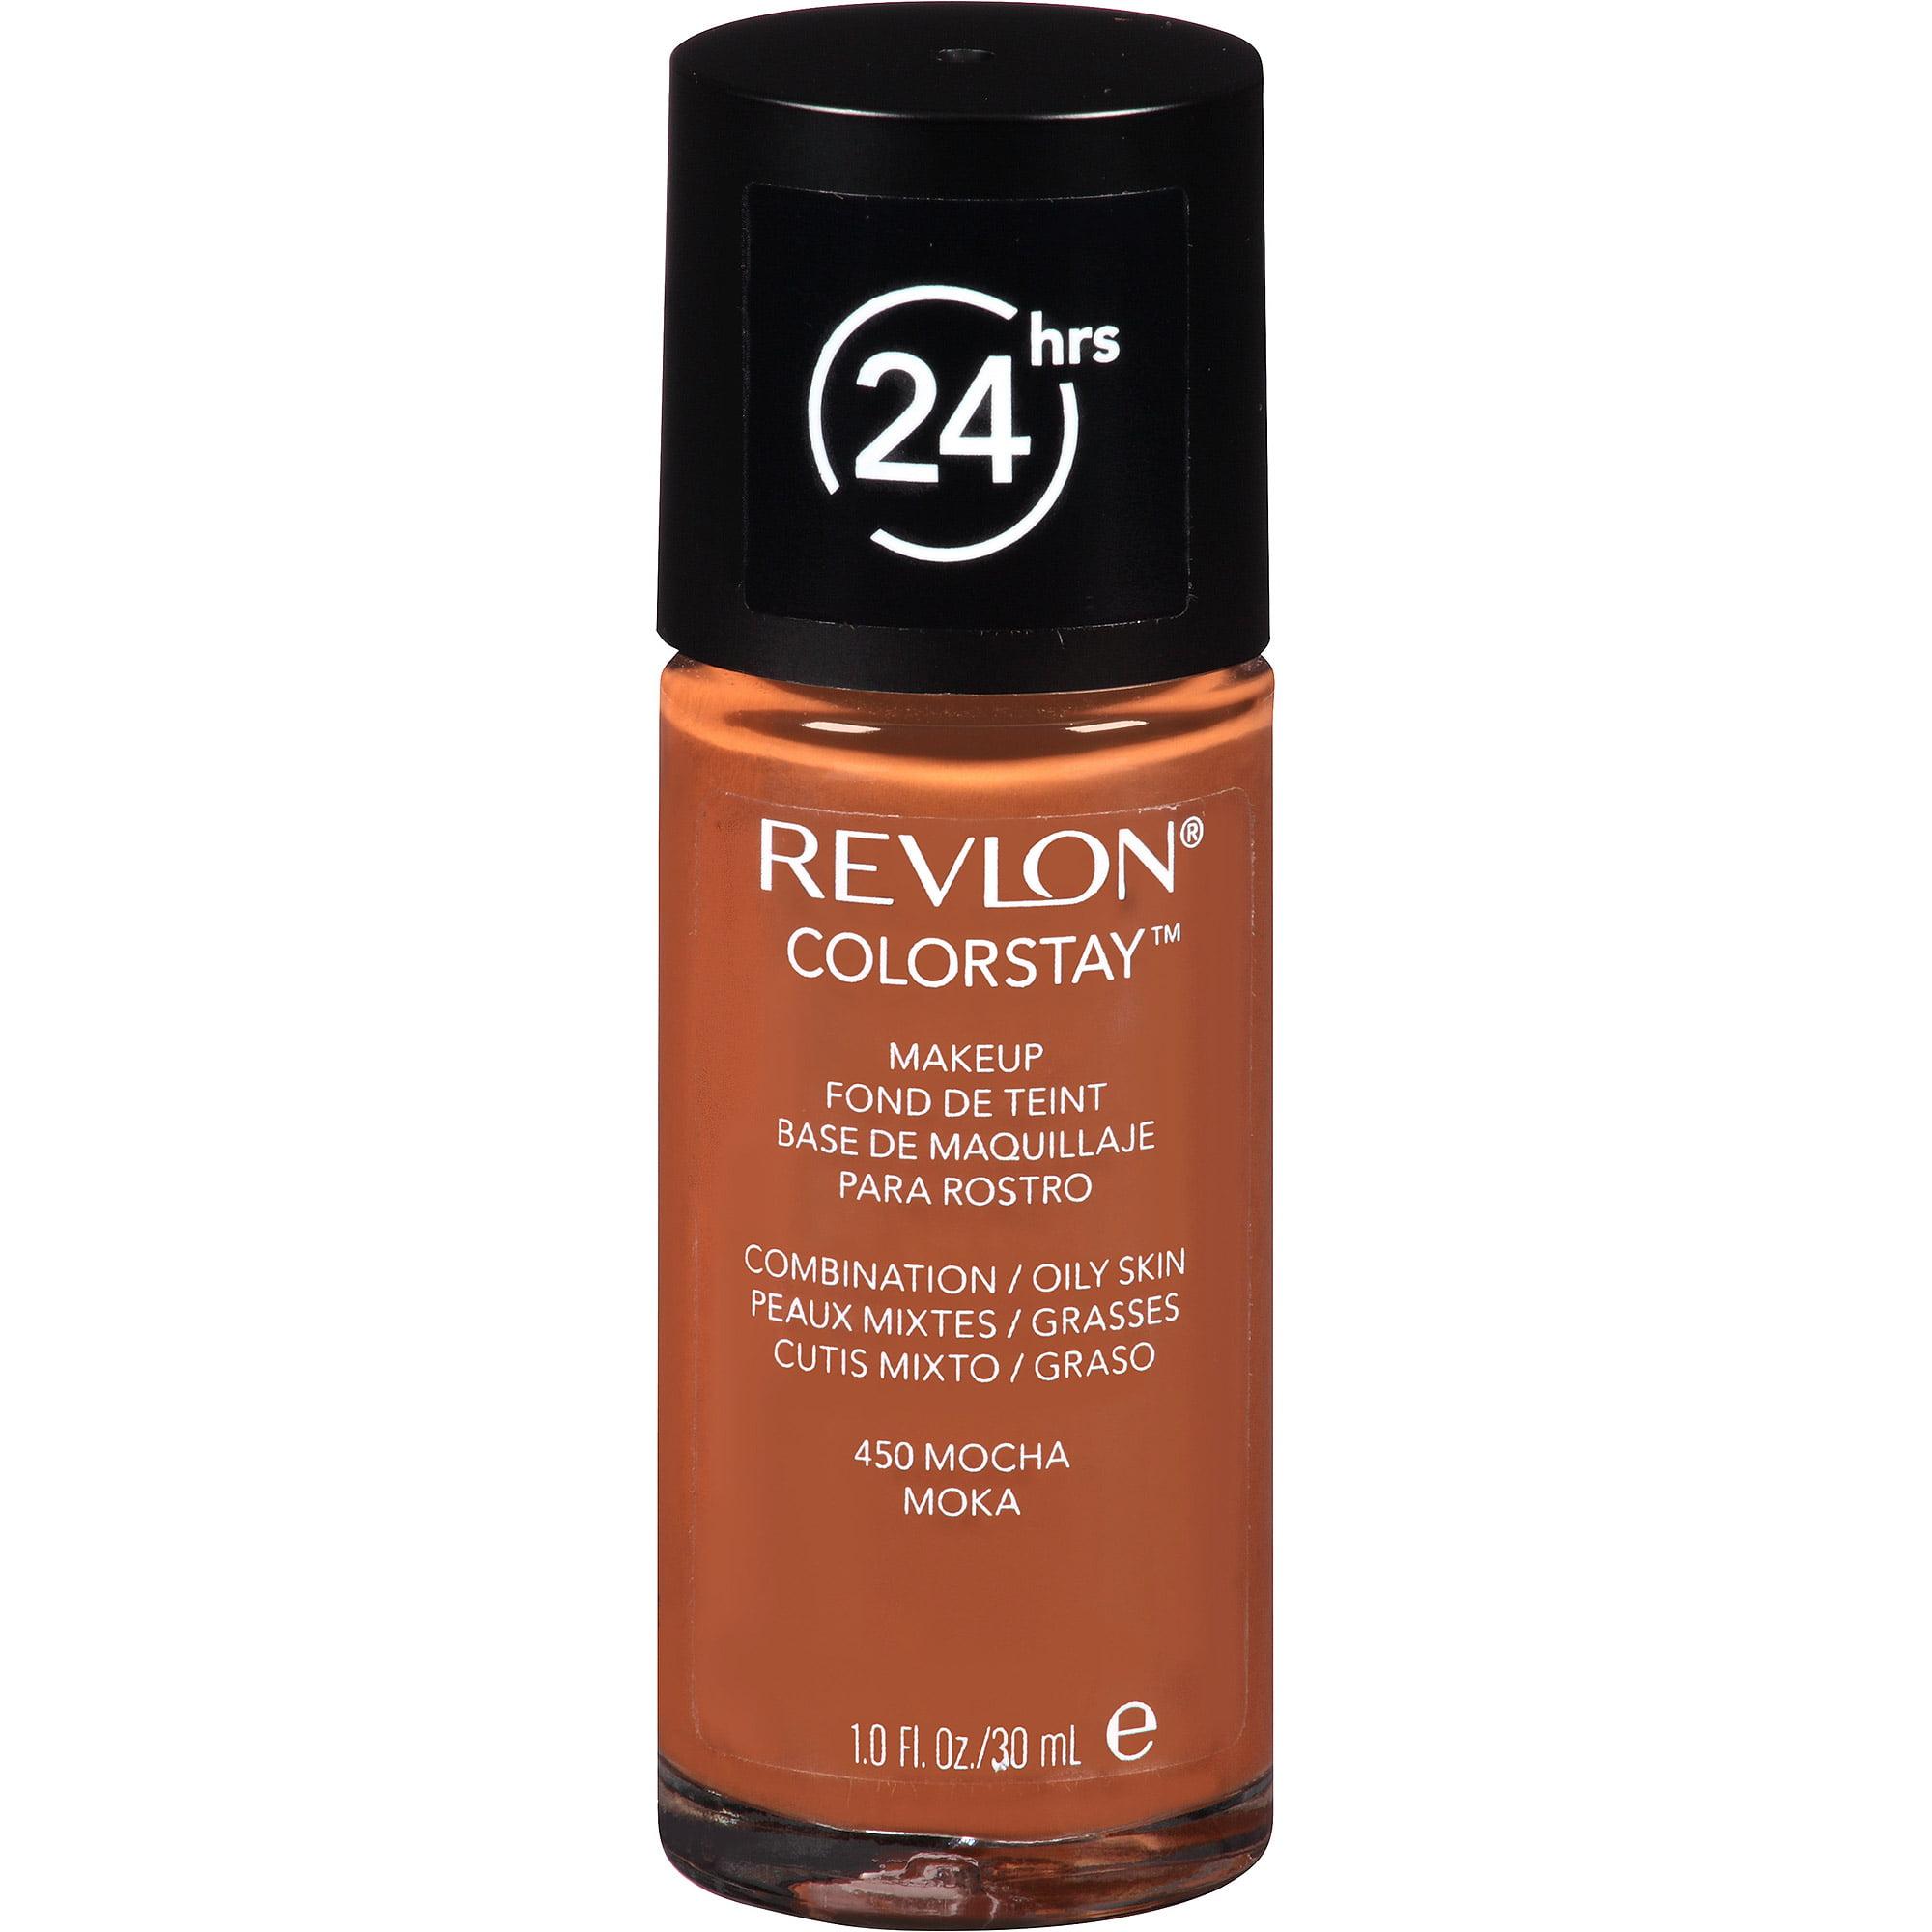 Revlon Classic Revlon Colorstay Makeup For Combination / oily Skin, 450